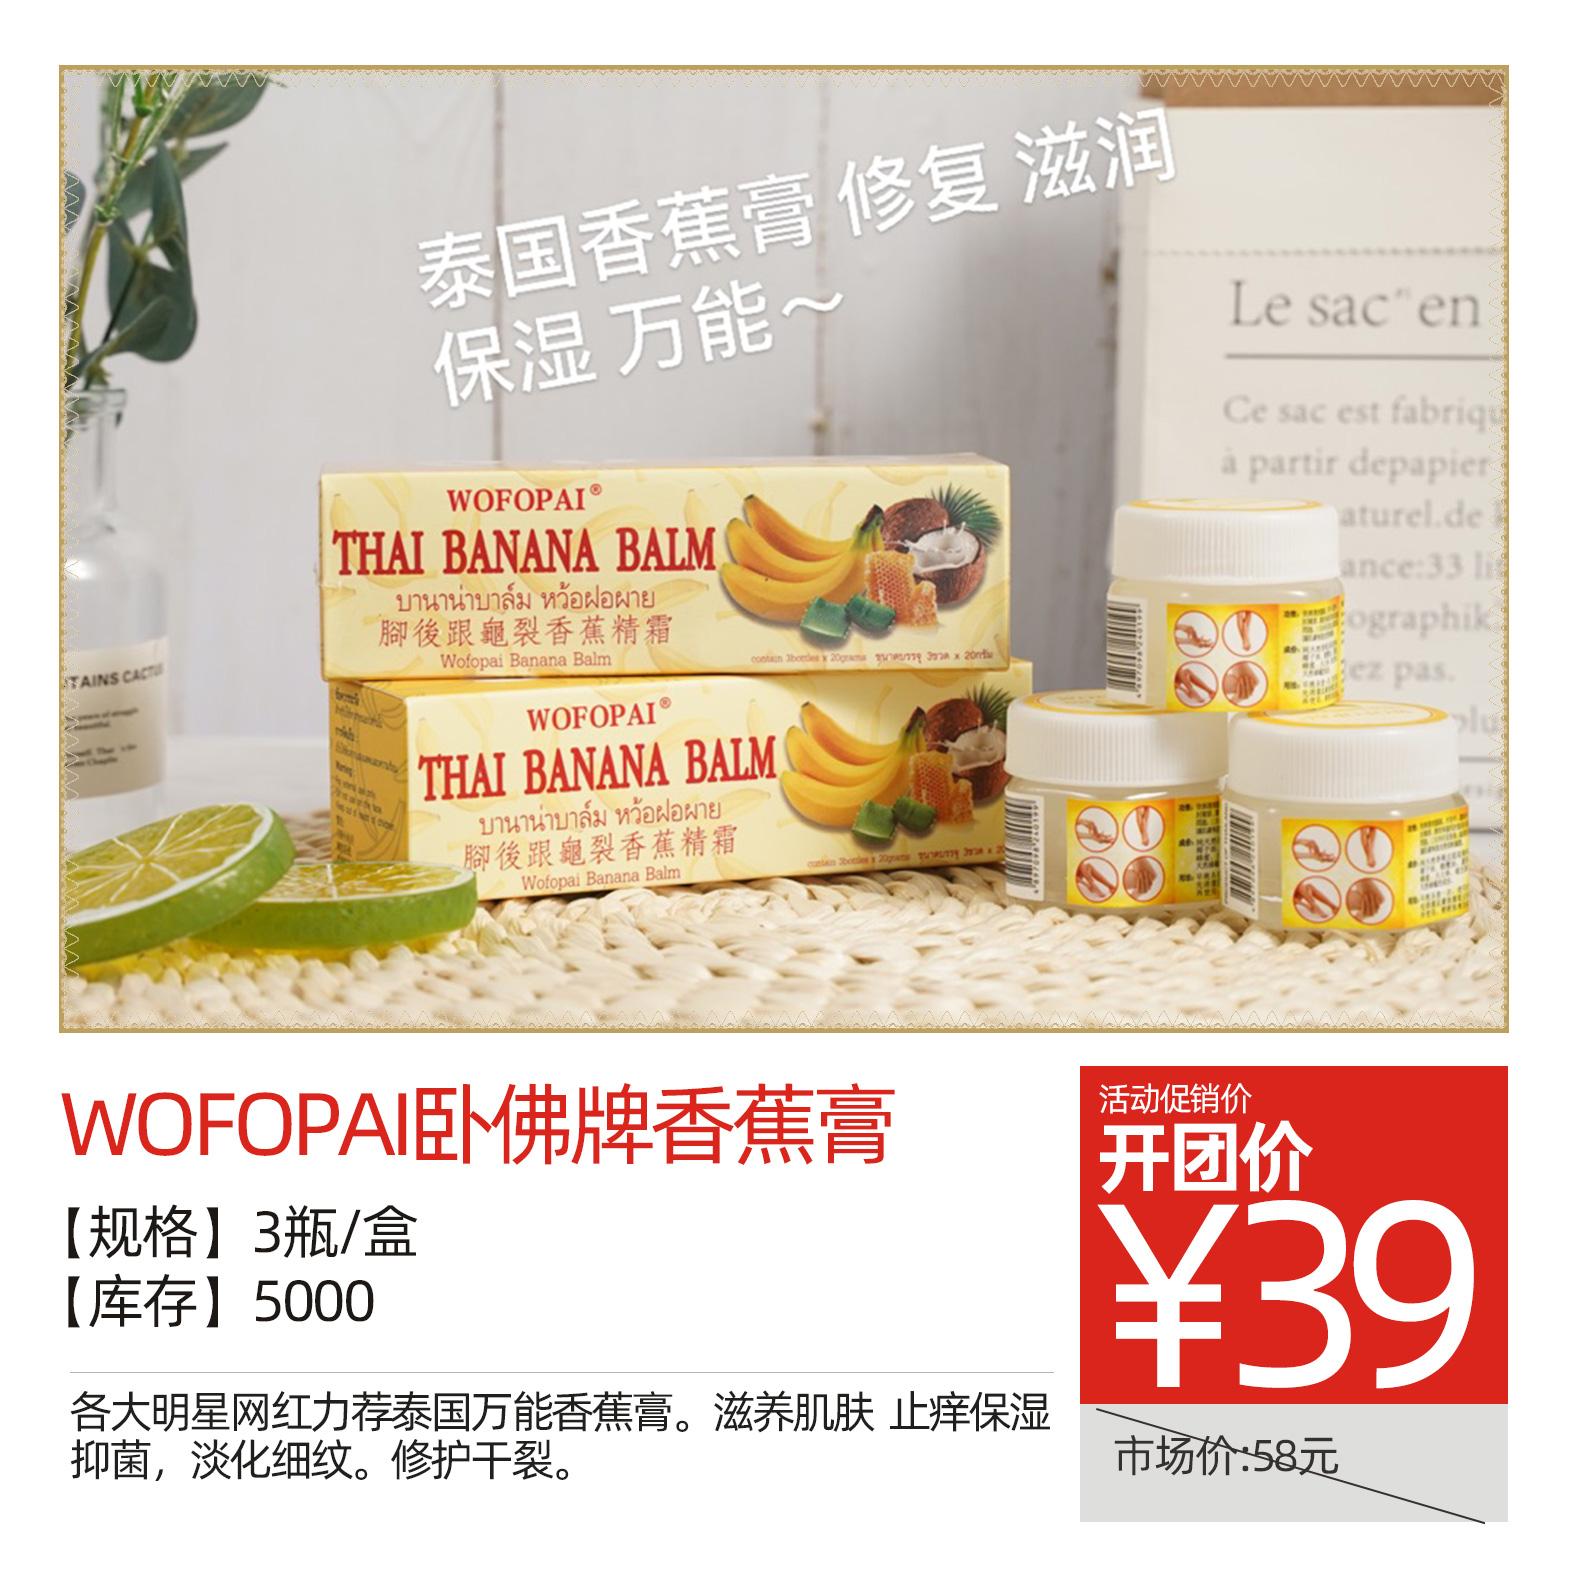 WOFOPAI卧佛牌香蕉膏